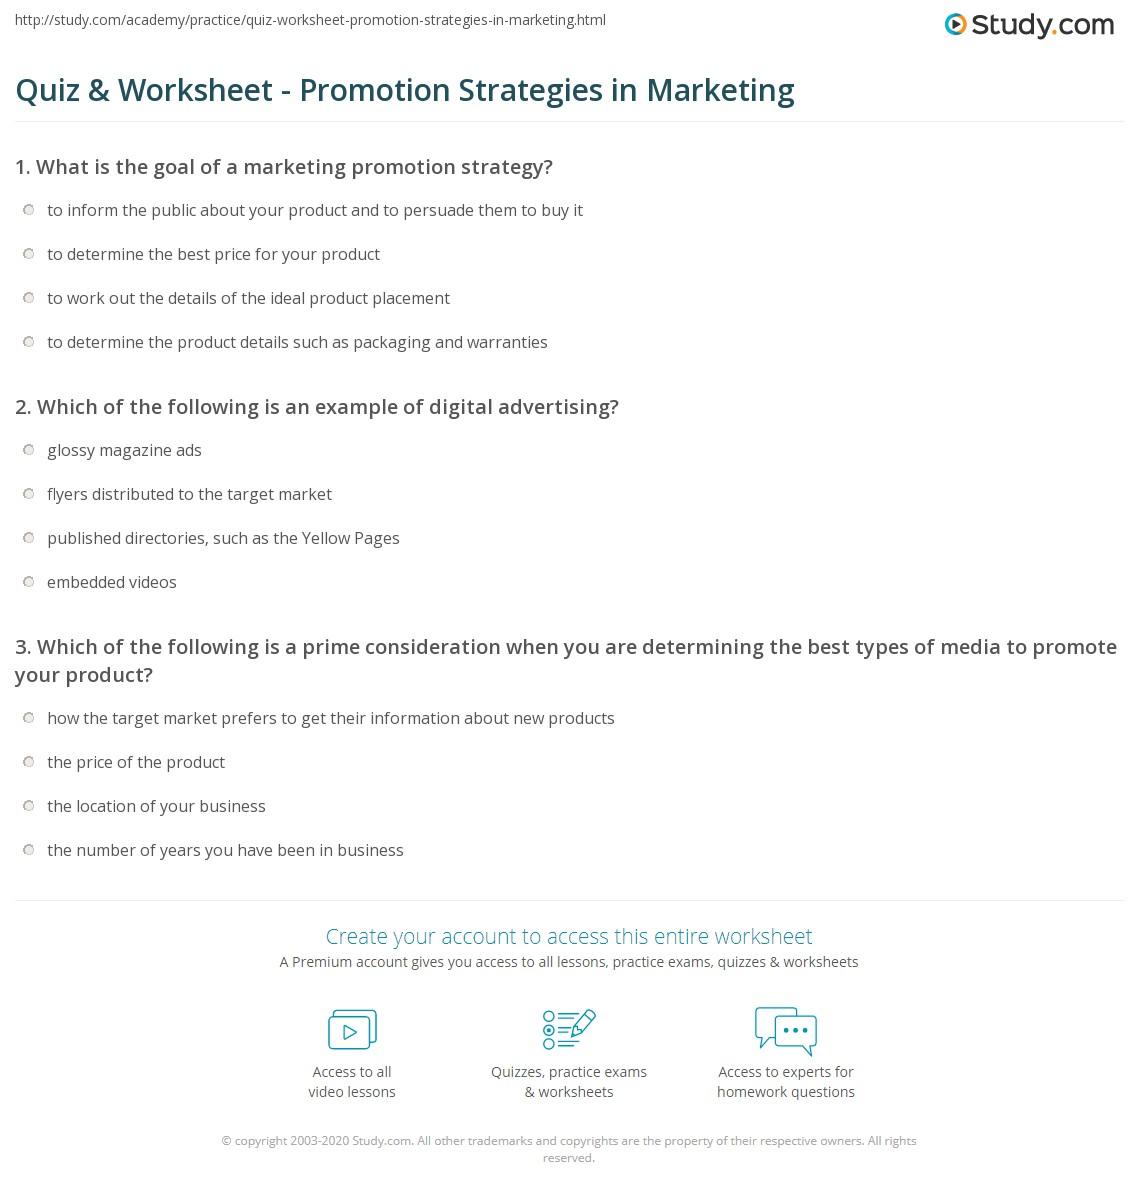 Quiz & Worksheet - Promotion Strategies in Marketing | Study.com